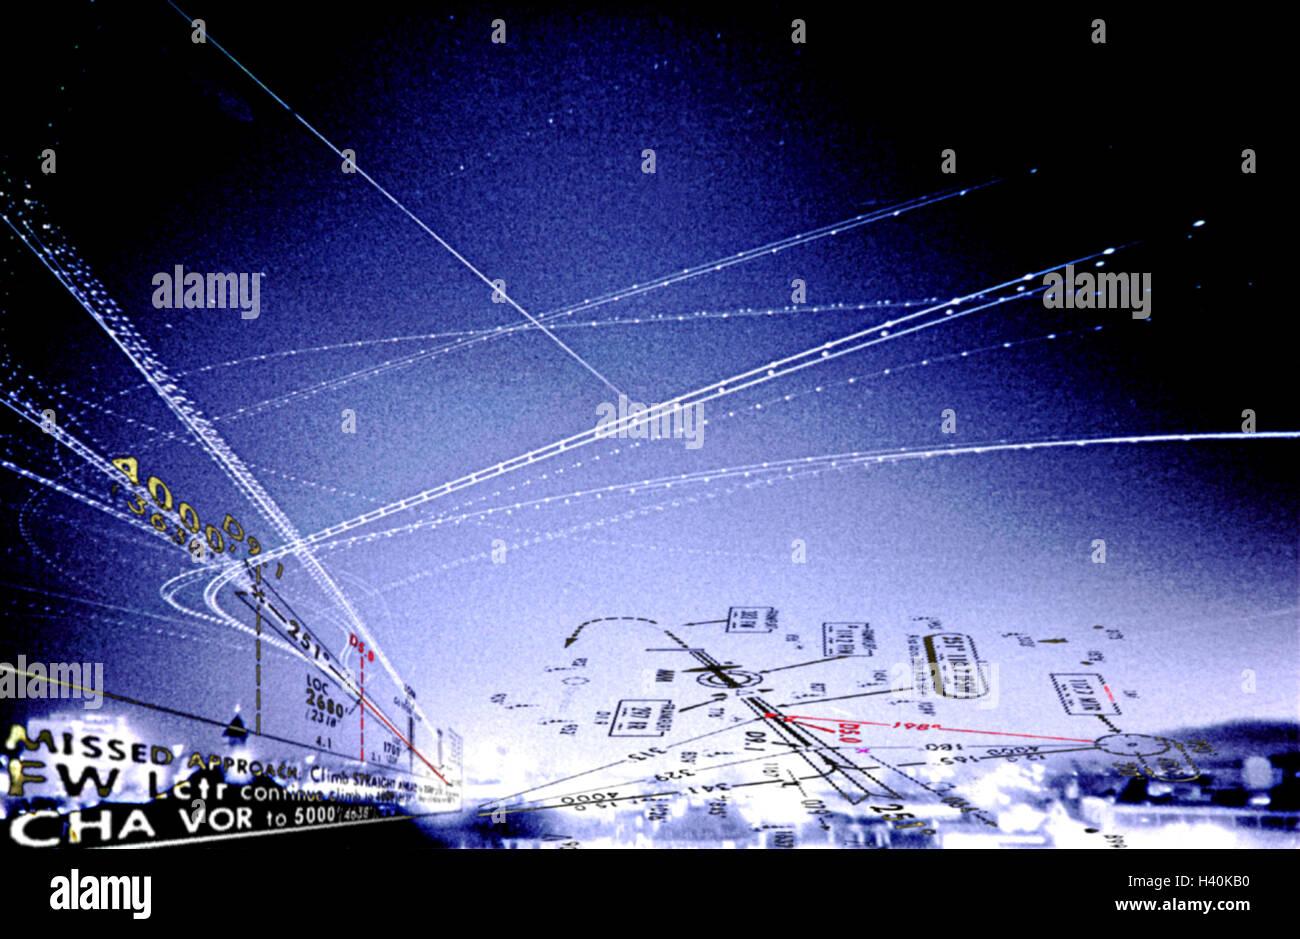 Composing, flight routes, flight tickets, instrument Landing system, ILS, night, air traffic, air traffic, navigation - Stock Image